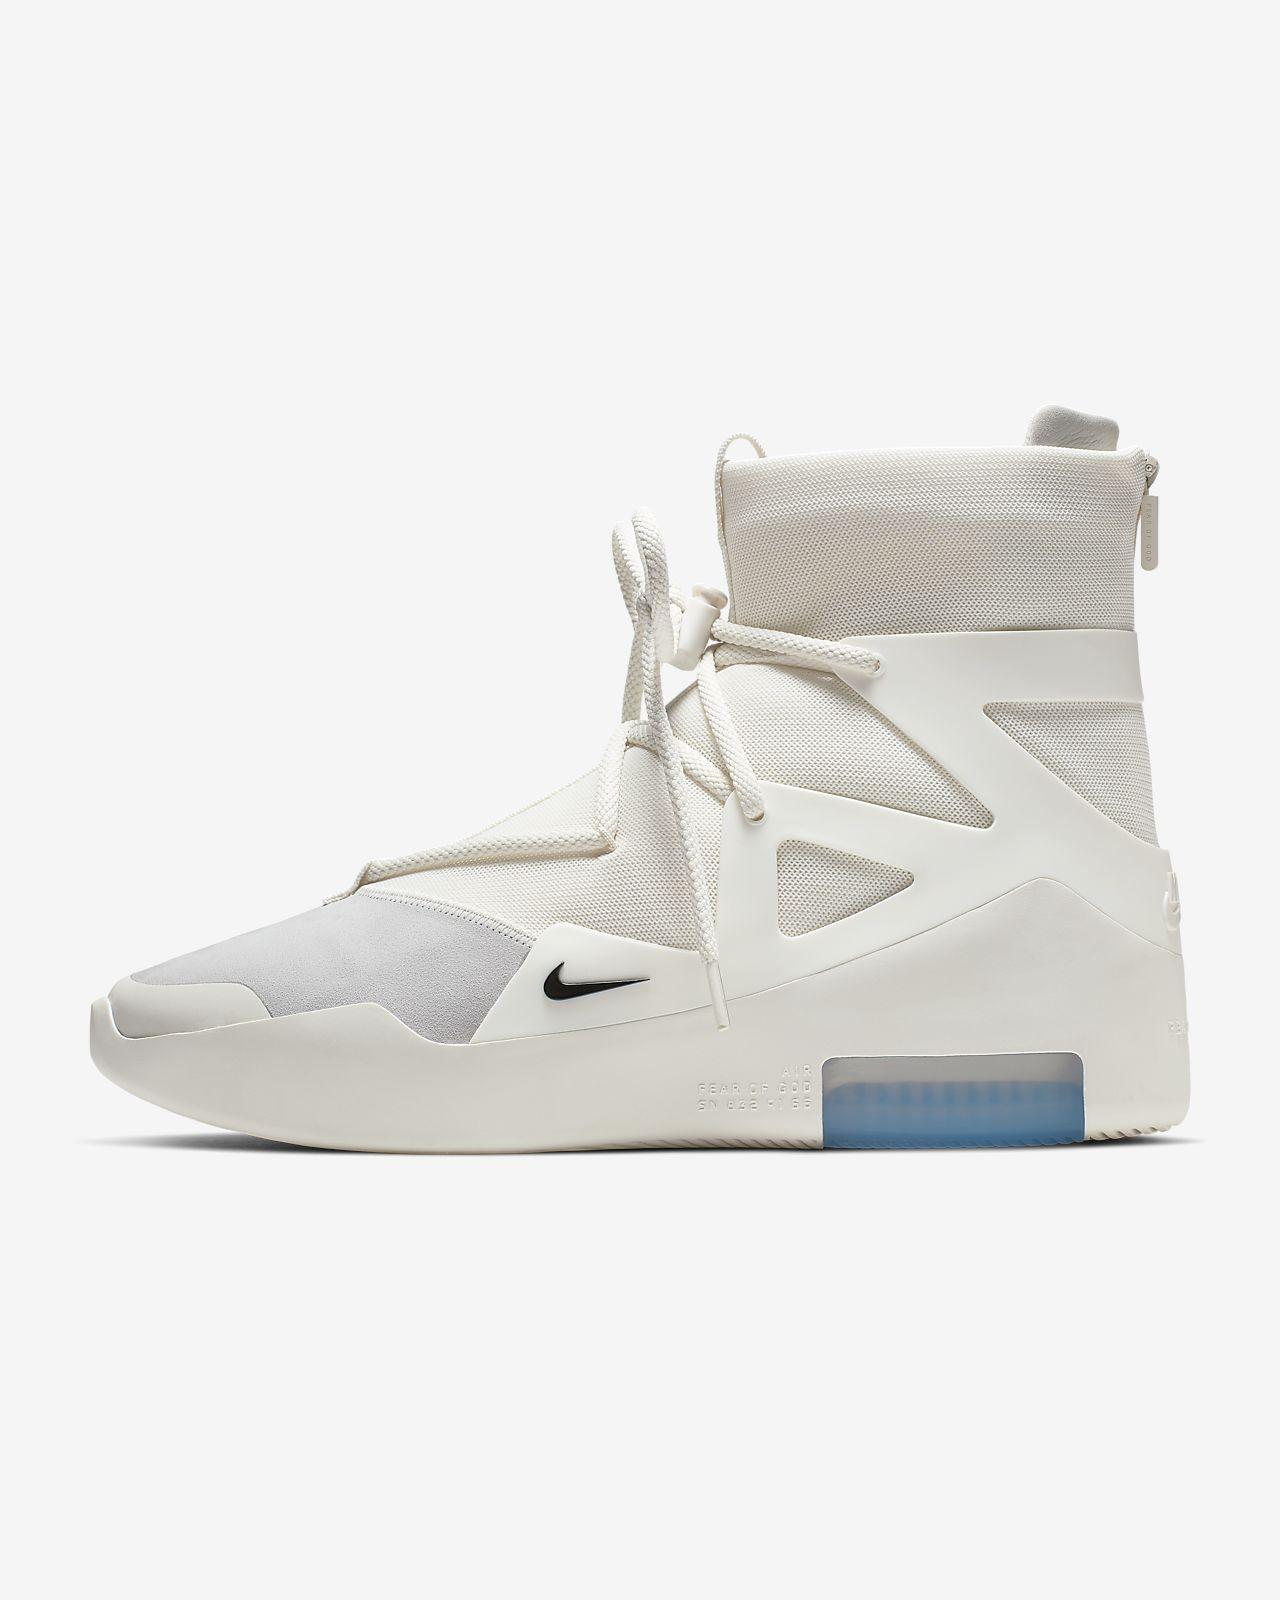 Nike Air 1 x Fear of God Shoe